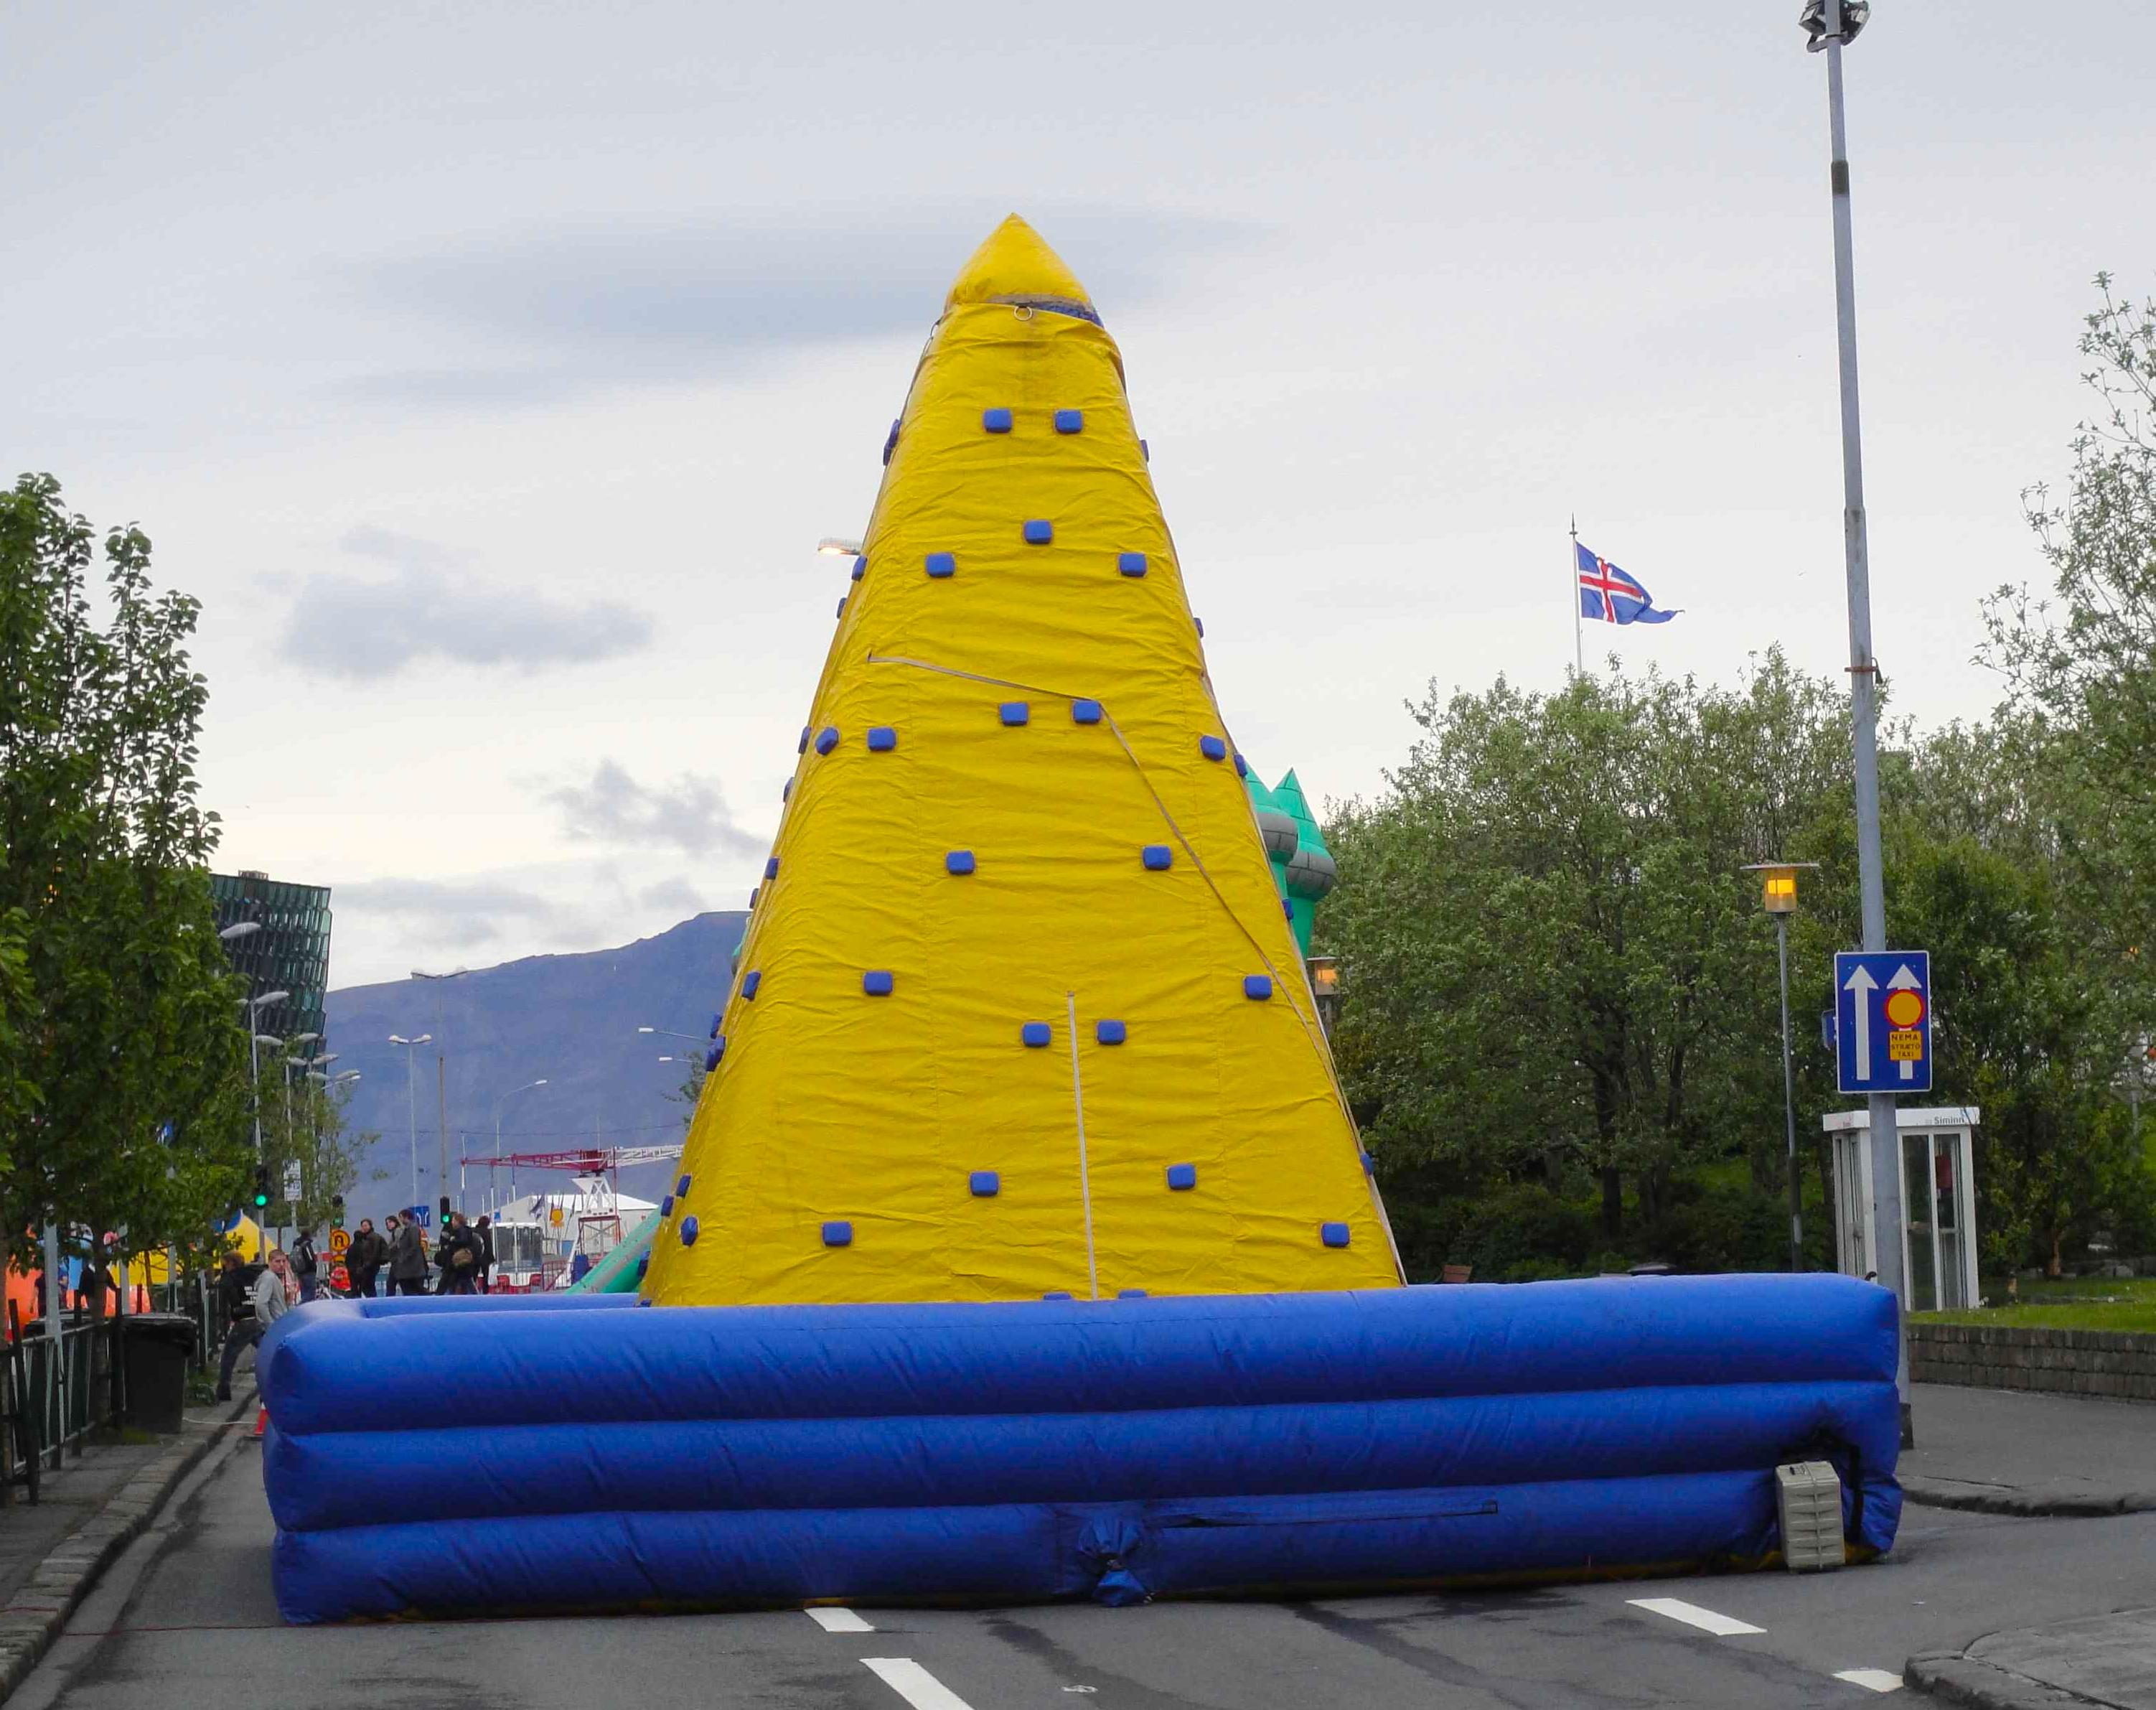 22_Reece_inflatable, Reykjavik 2011